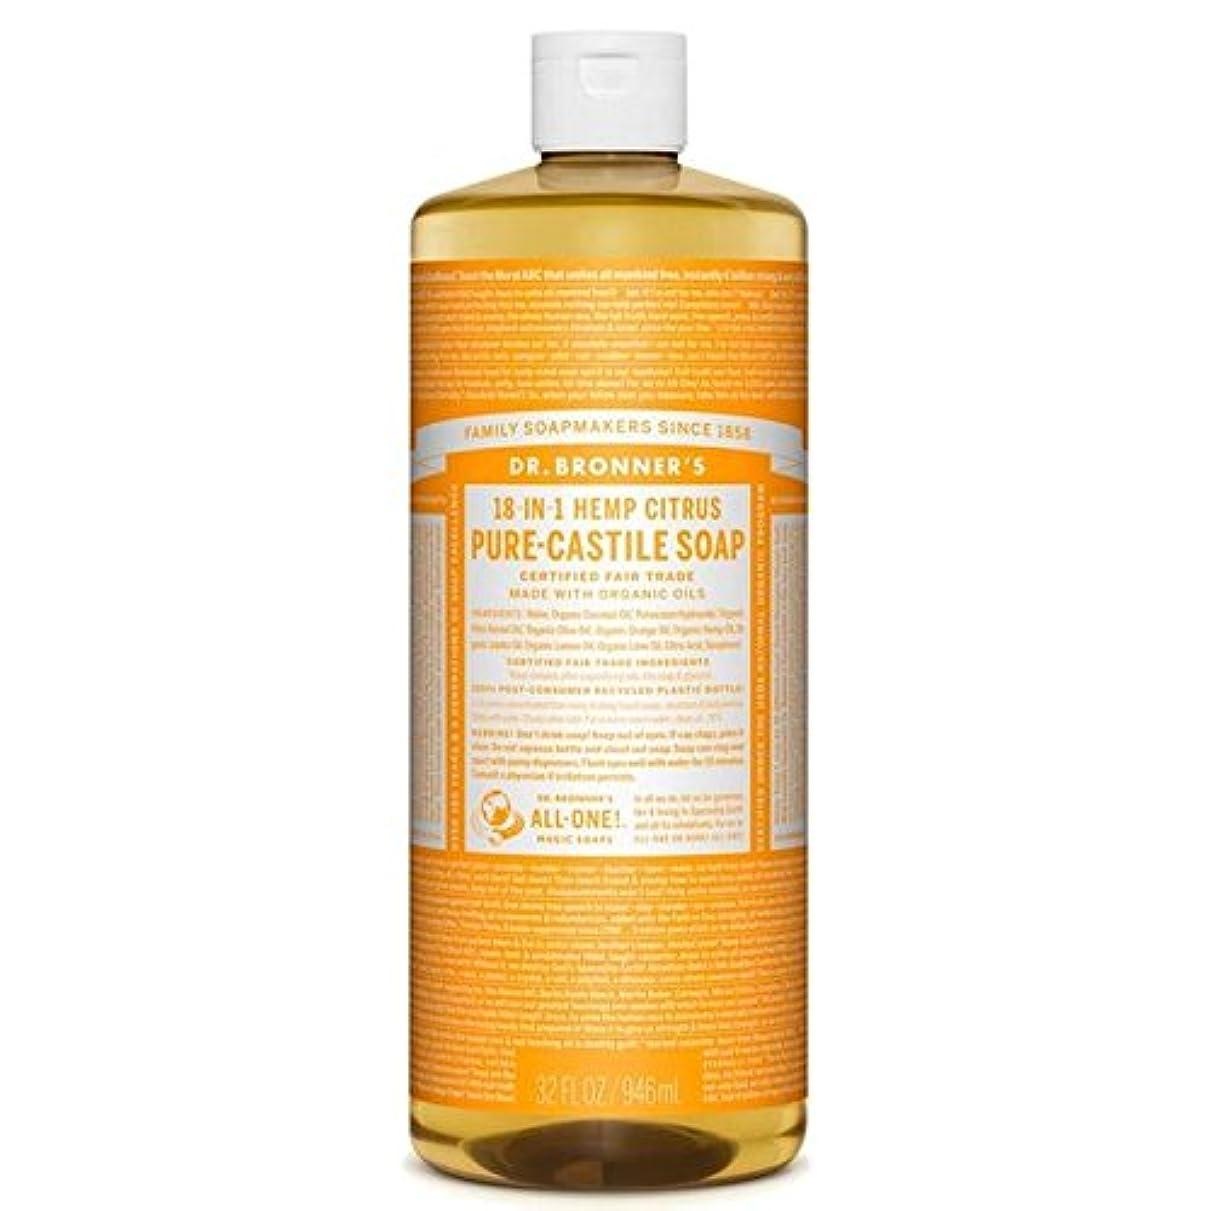 Dr Bronner Organic Citrus Castile Liquid Soap 946ml (Pack of 6) - のブロナーオーガニックシトラスカスティーリャ液体石鹸946ミリリットル x6 [並行輸入品]